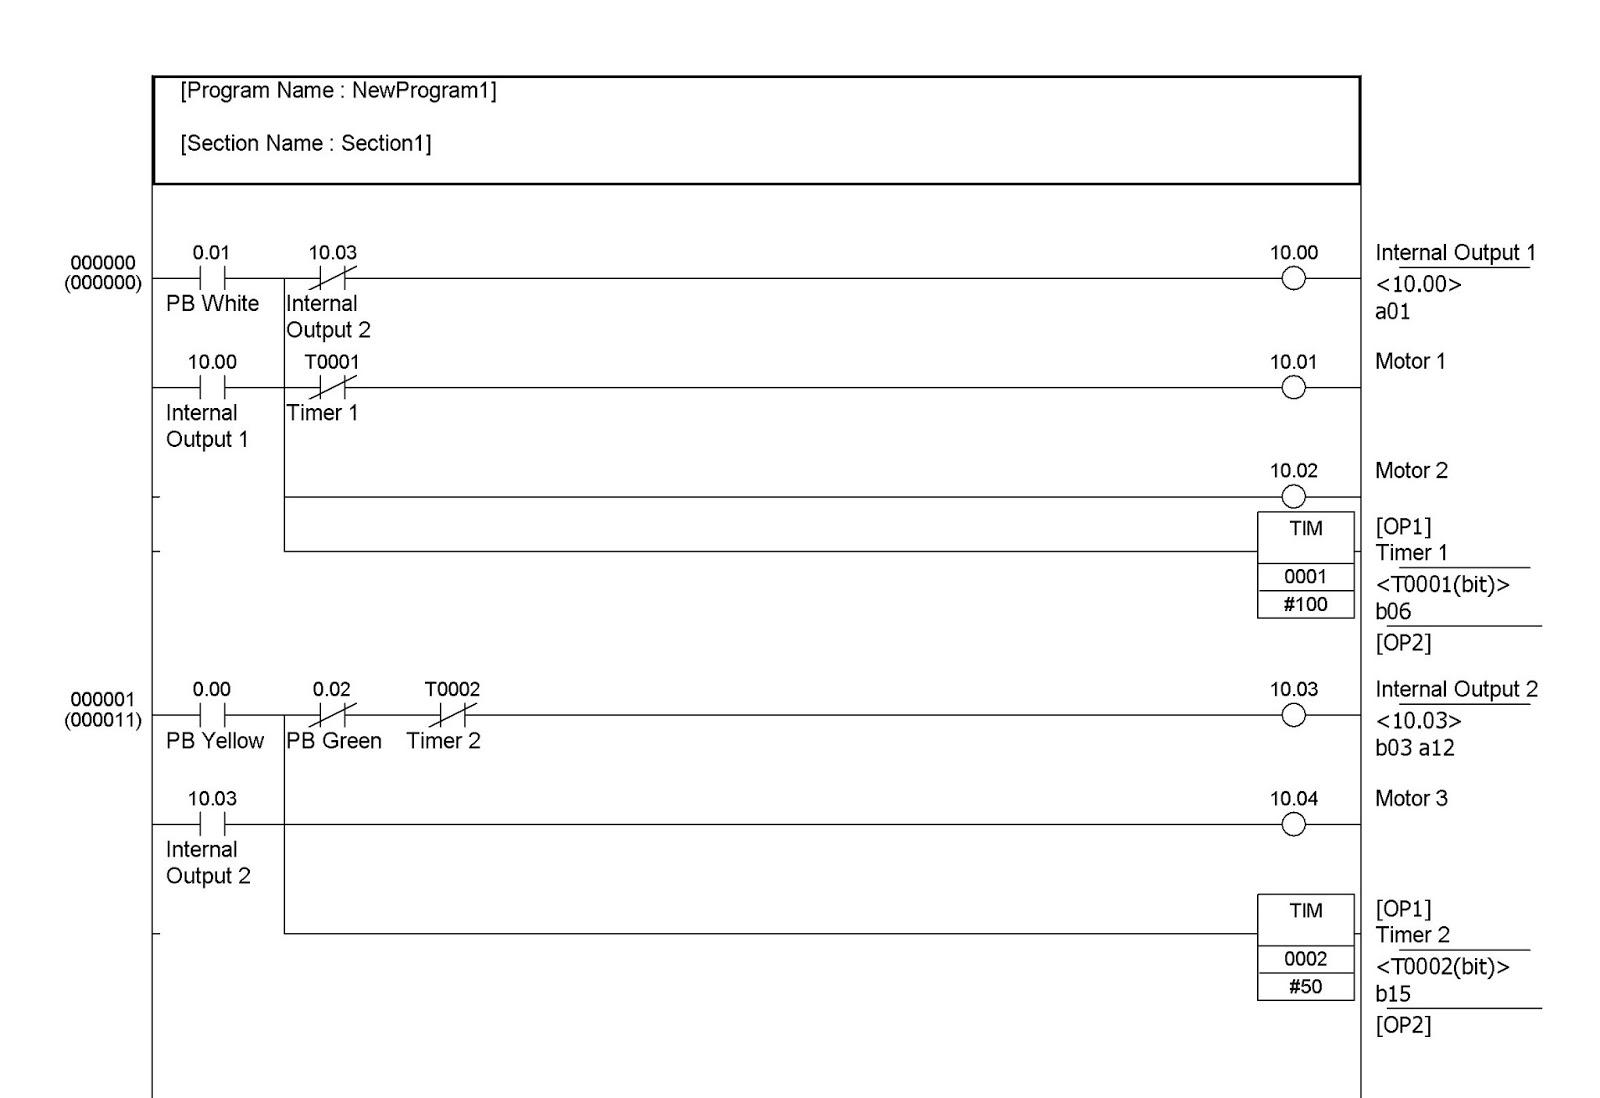 Start Stop Plc Ladder Diagram Stlfamilylife Mitsubishi Logic Program For The Star Delta Motor Control Wiring Of A Diagrams Schematics